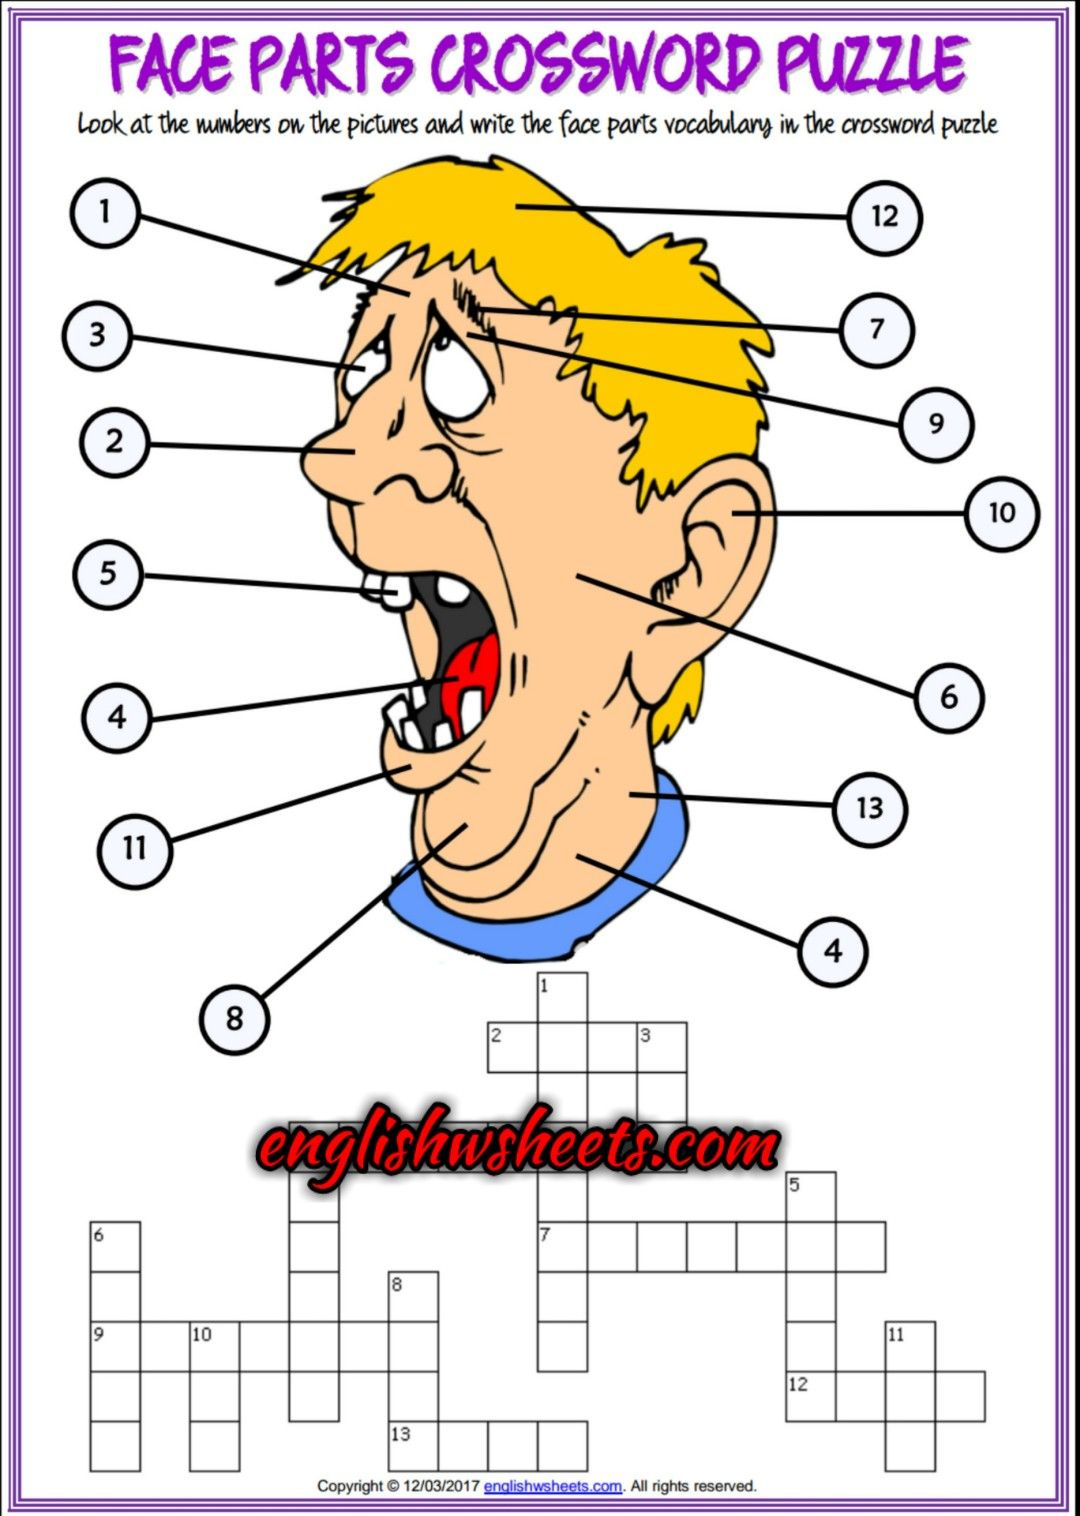 Face Parts Esl Printable Crossword Puzzle Worksheets For Kids | Esl - Printable Face Puzzle